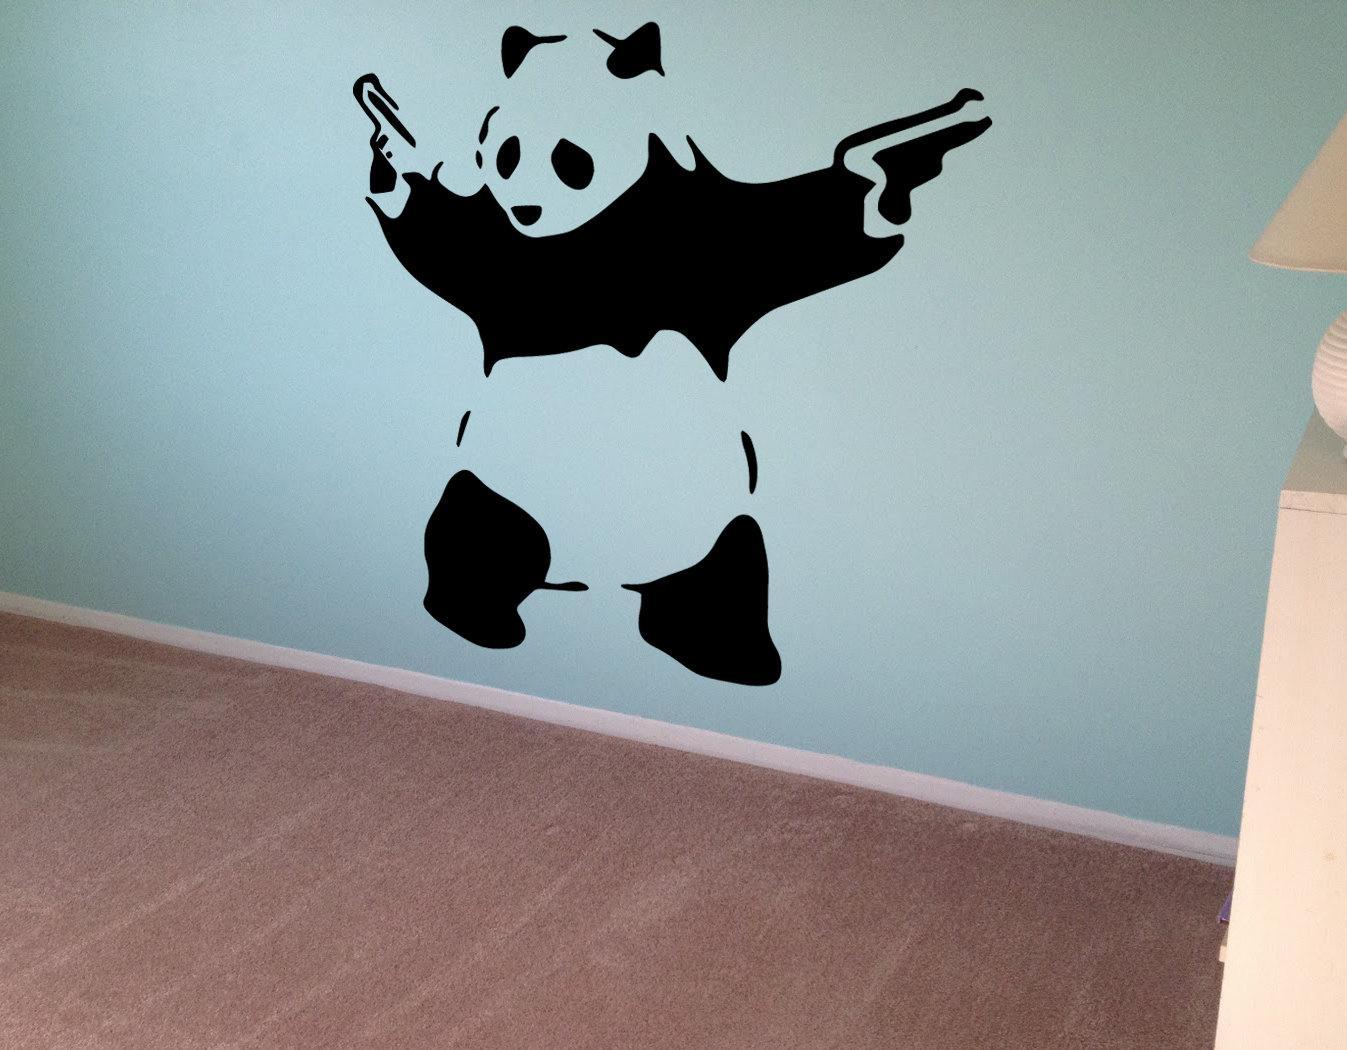 Banksy Wall Decal Panda Guns Wall Art Wall Sticker Vinyl In Graffiti Wall Art Stickers (Image 3 of 20)